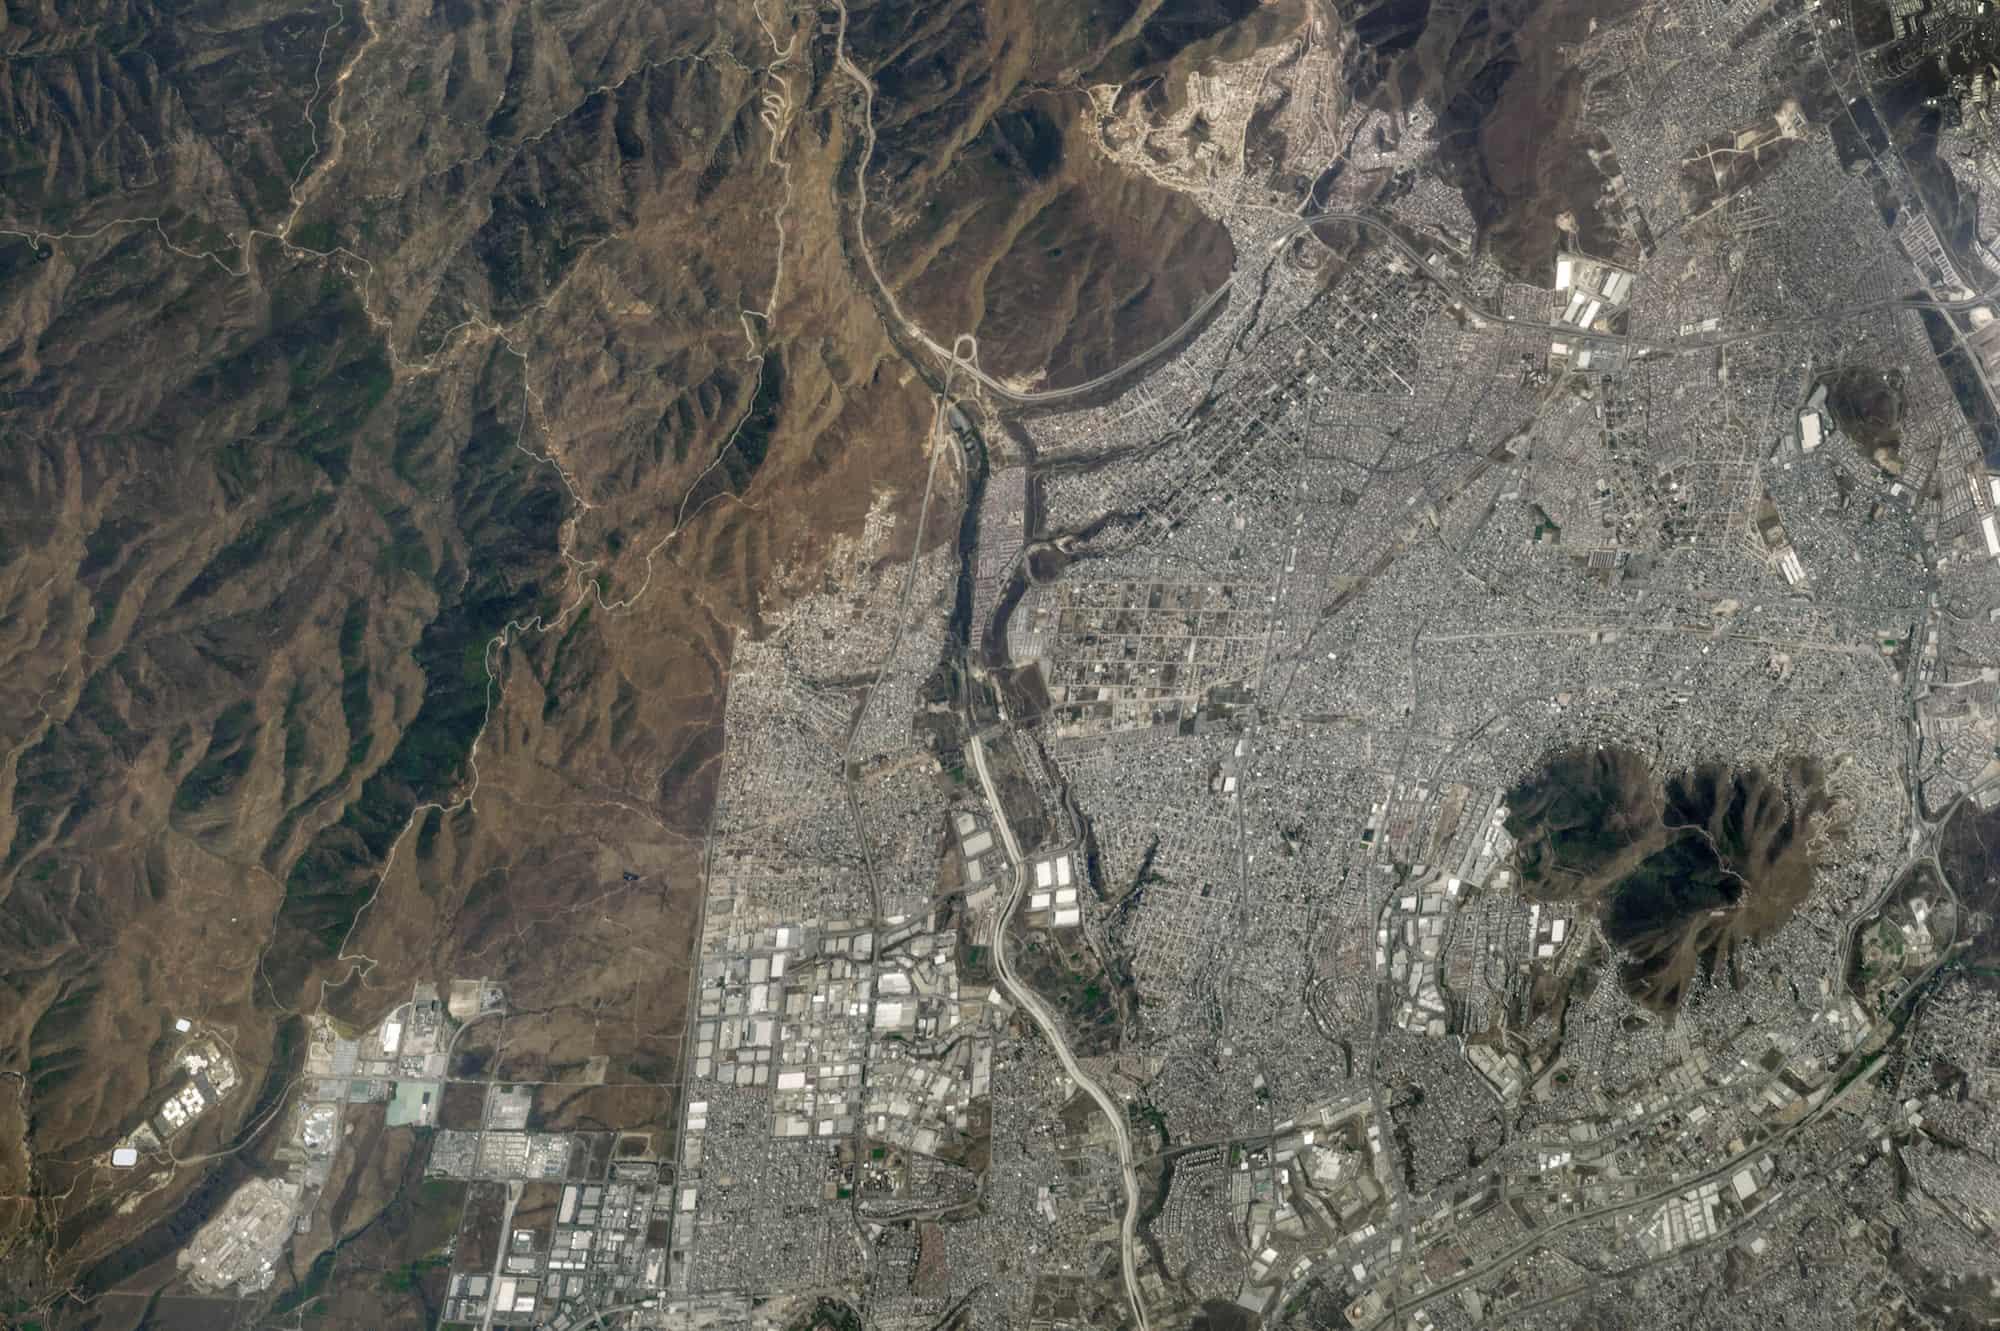 Photograph of Tijuana, Mexico.